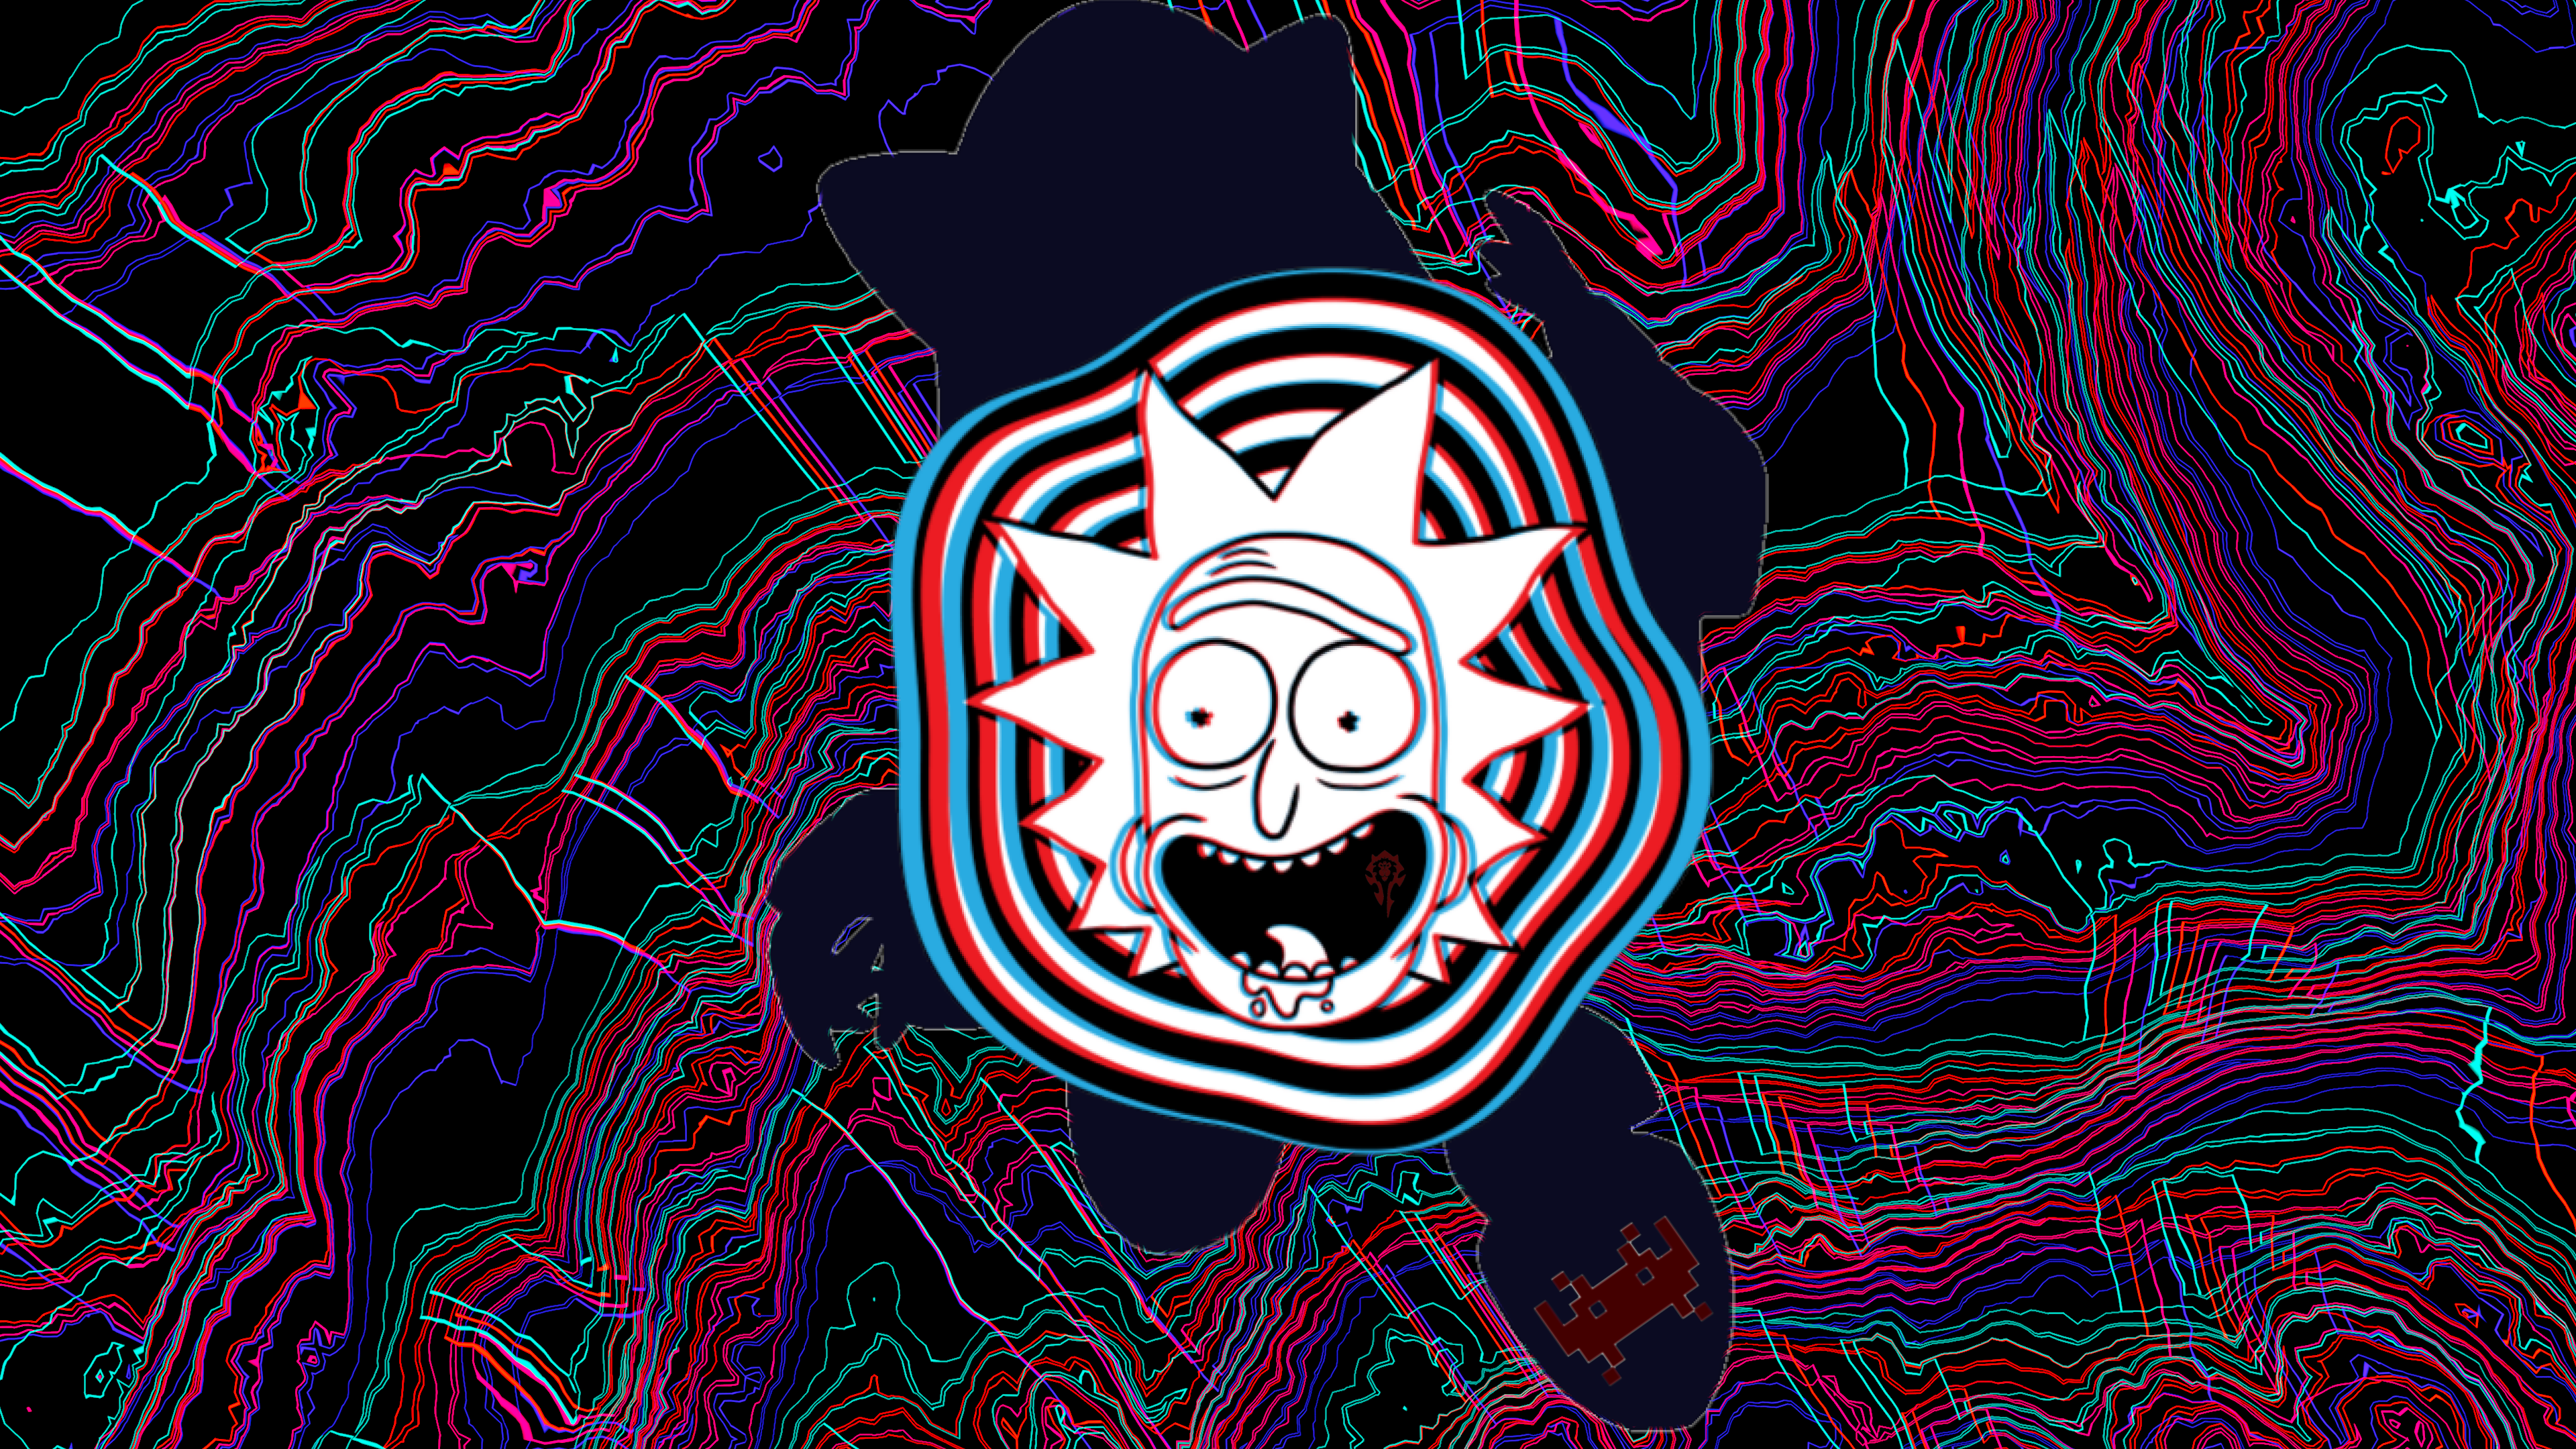 Glitch 4k Ultra Hd Wallpaper Background Image 3840x2160 Id 1010763 Wallpaper Abyss